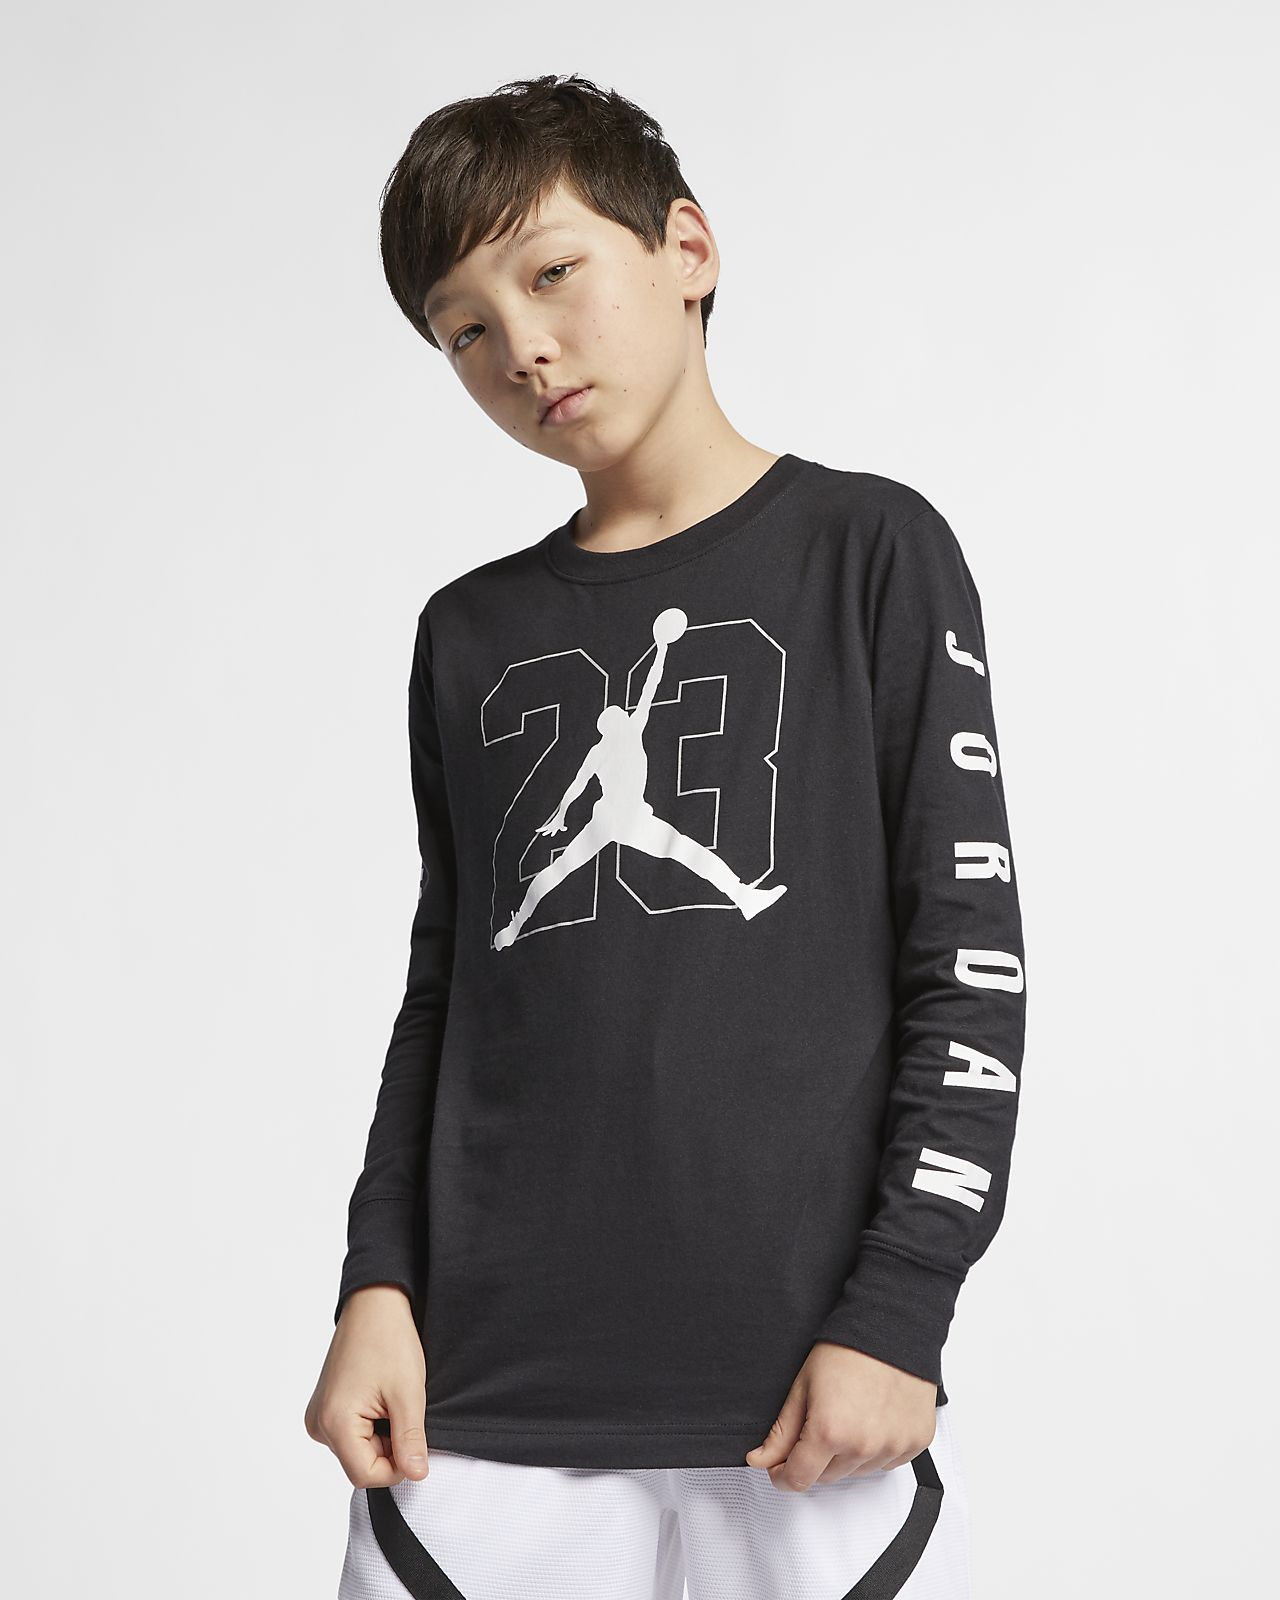 07f13e44 Jordan Jumpman 23 Big Kids' (Boys') Long-Sleeve Graphic T-Shirt ...